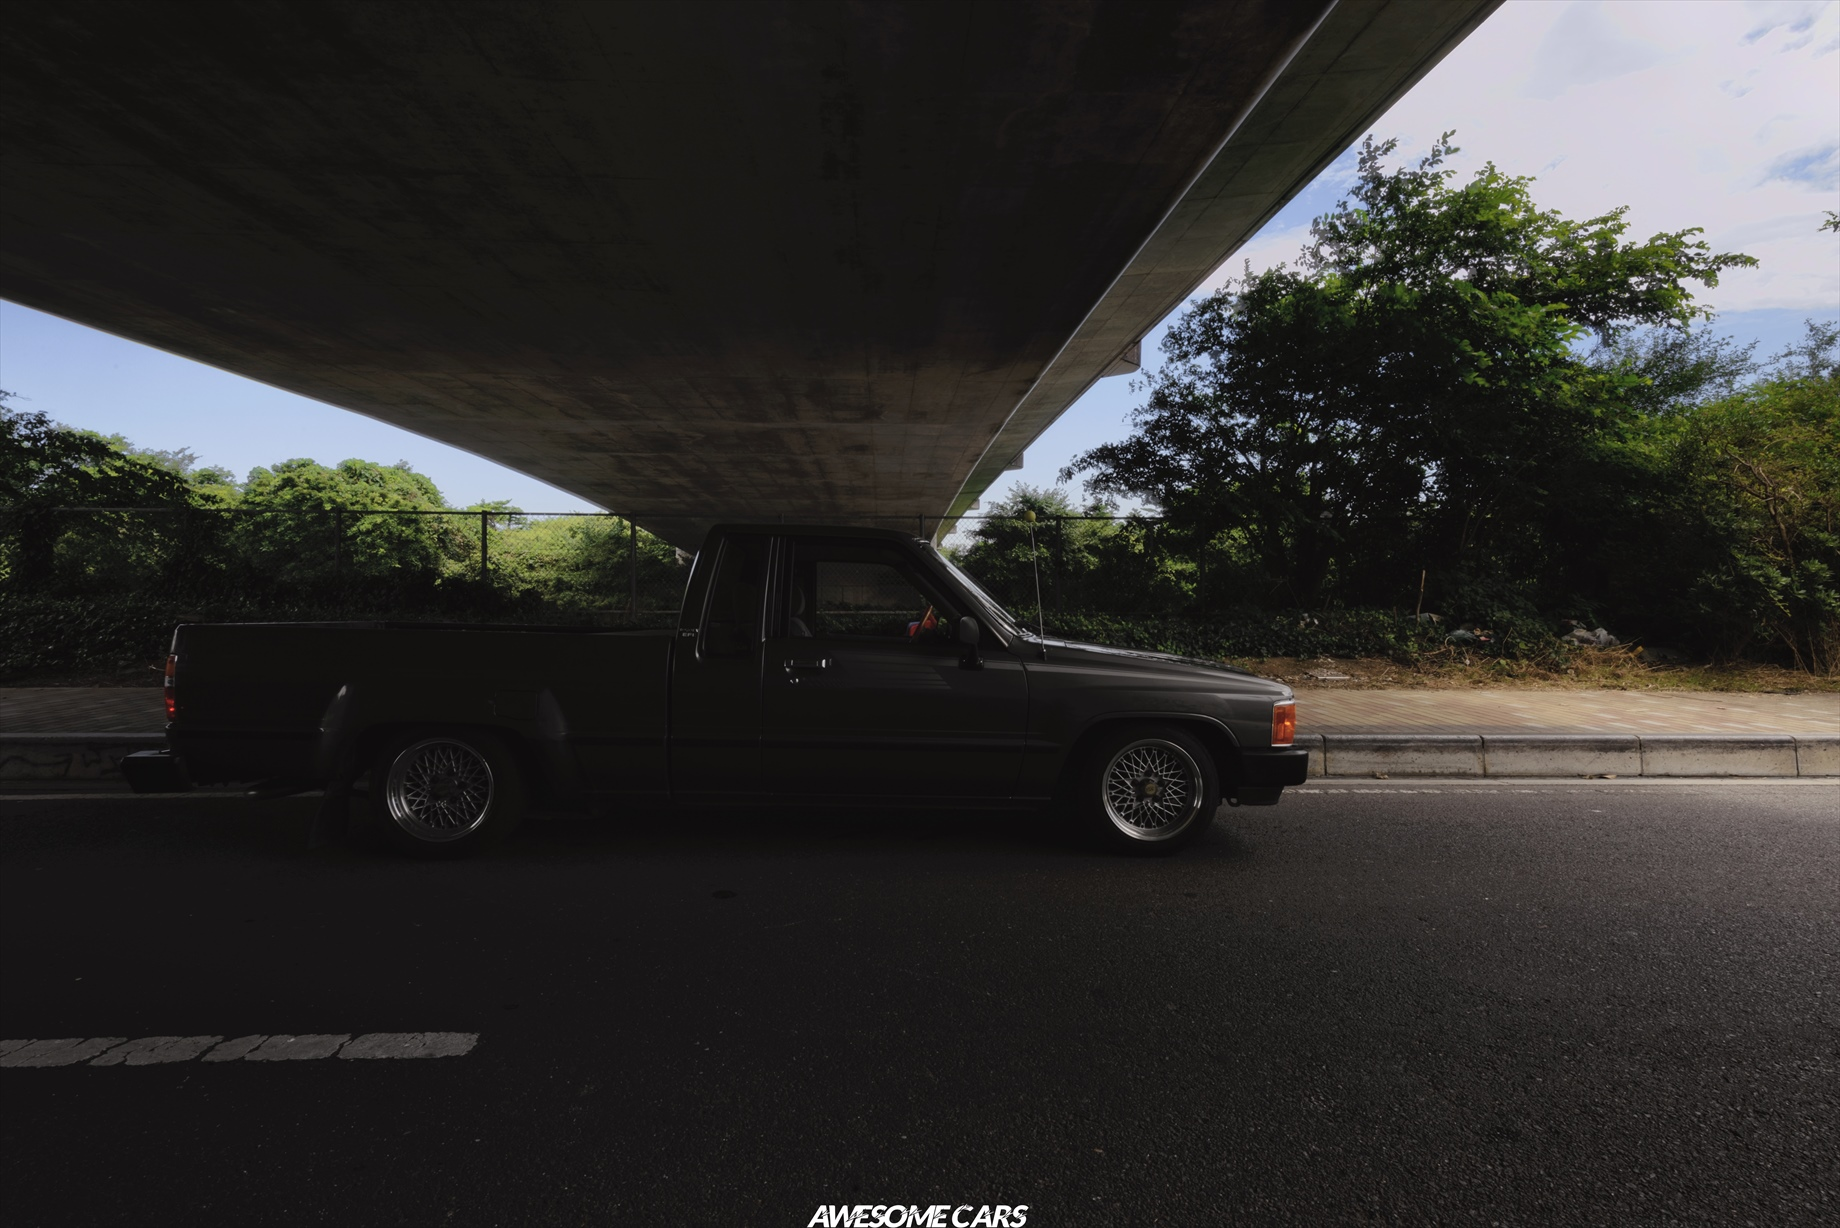 DSC_2412-Edit-3_R.jpg